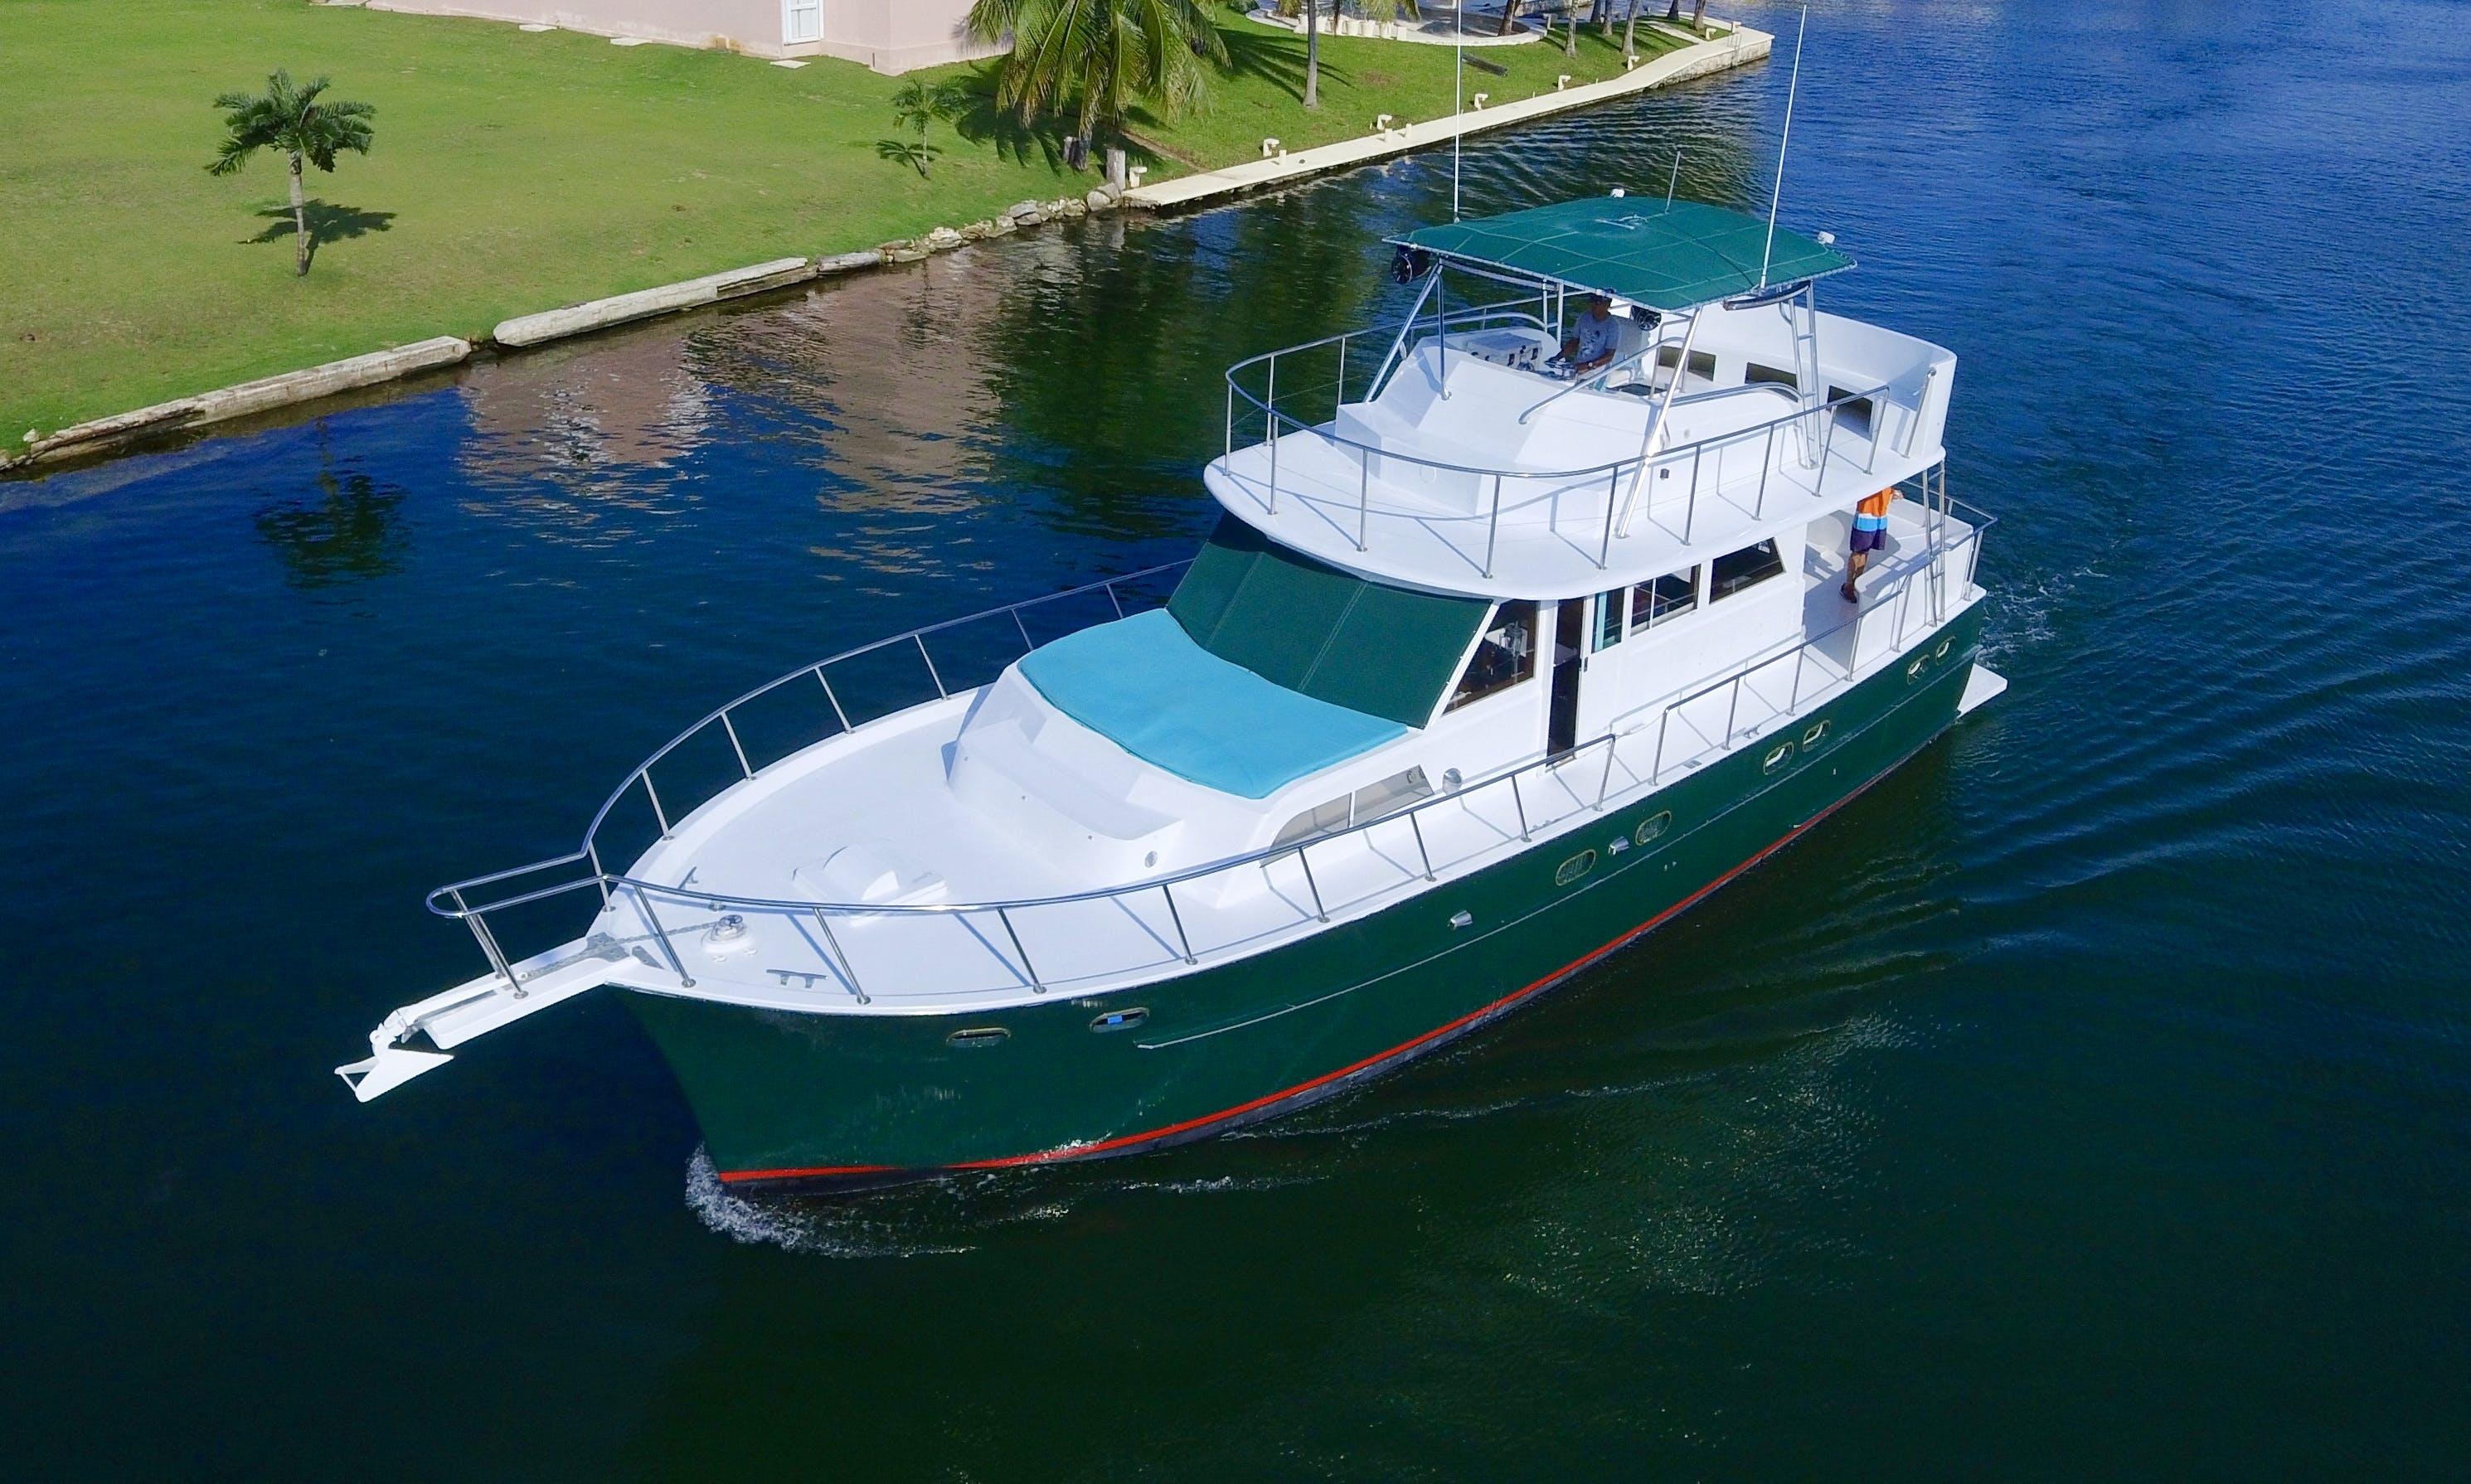 58' Hatteras Motor Yacht